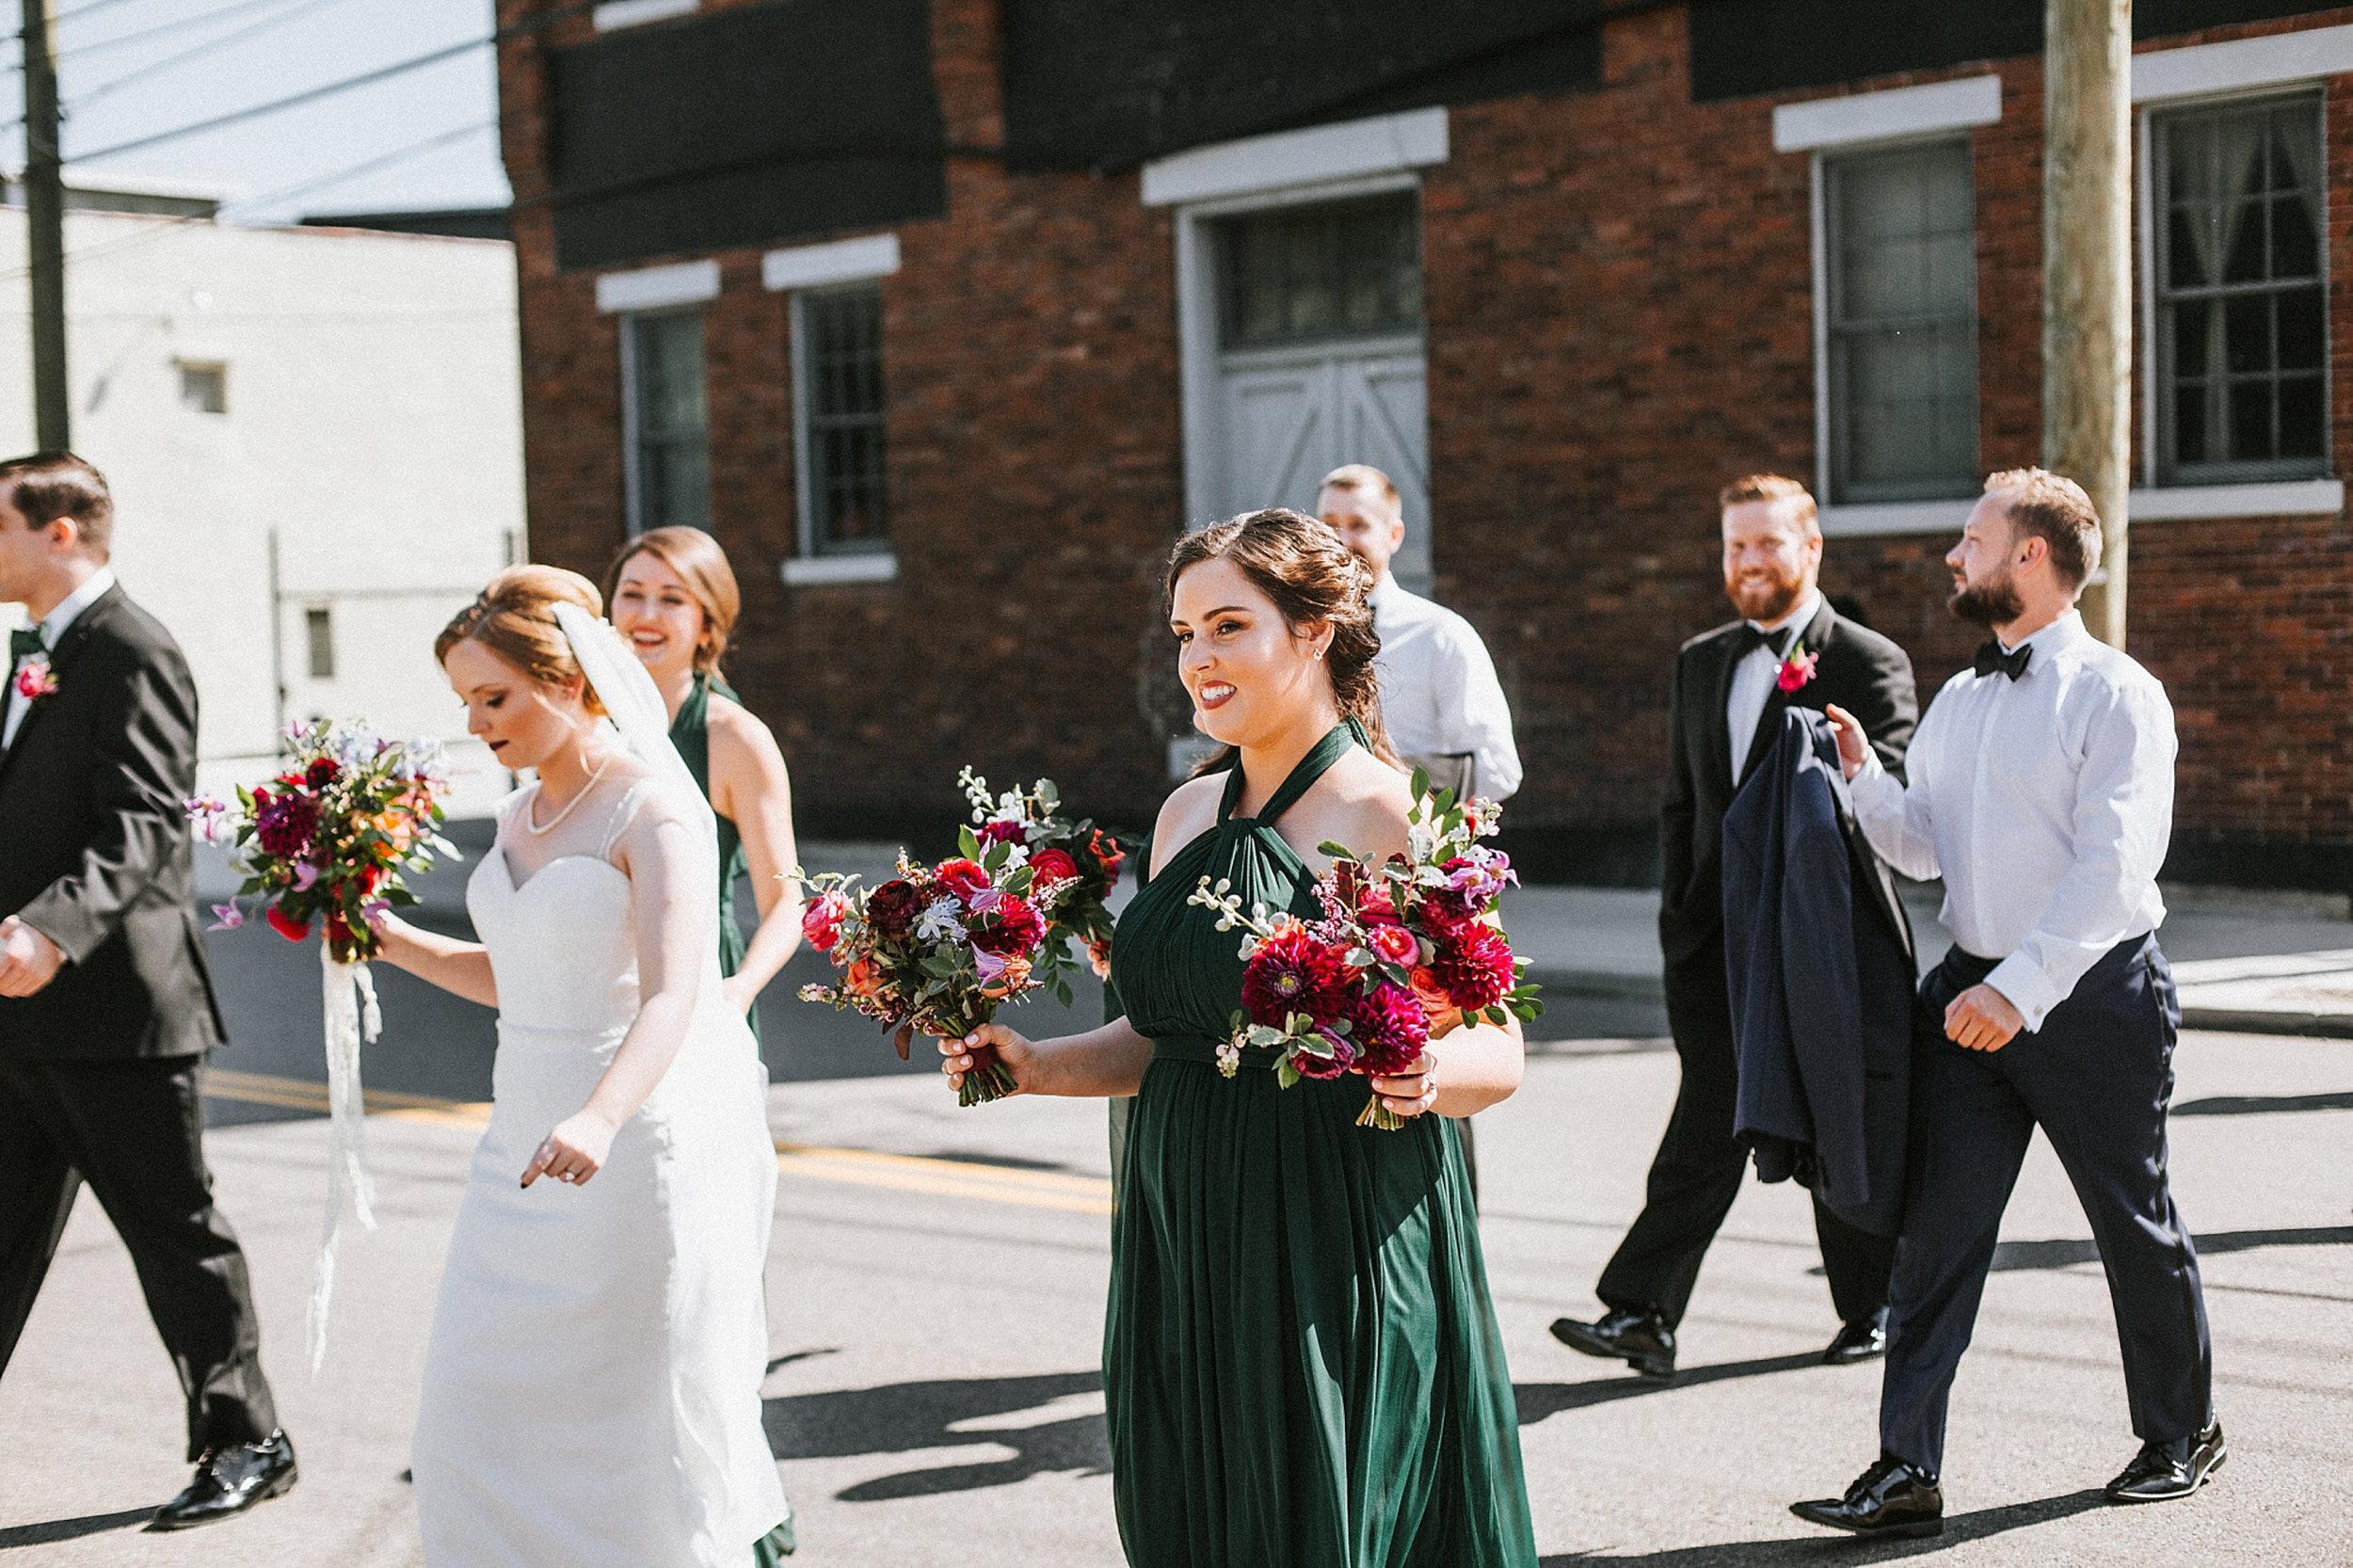 Brooke Townsend Photography - Ohio Wedding Photographer-71.jpg